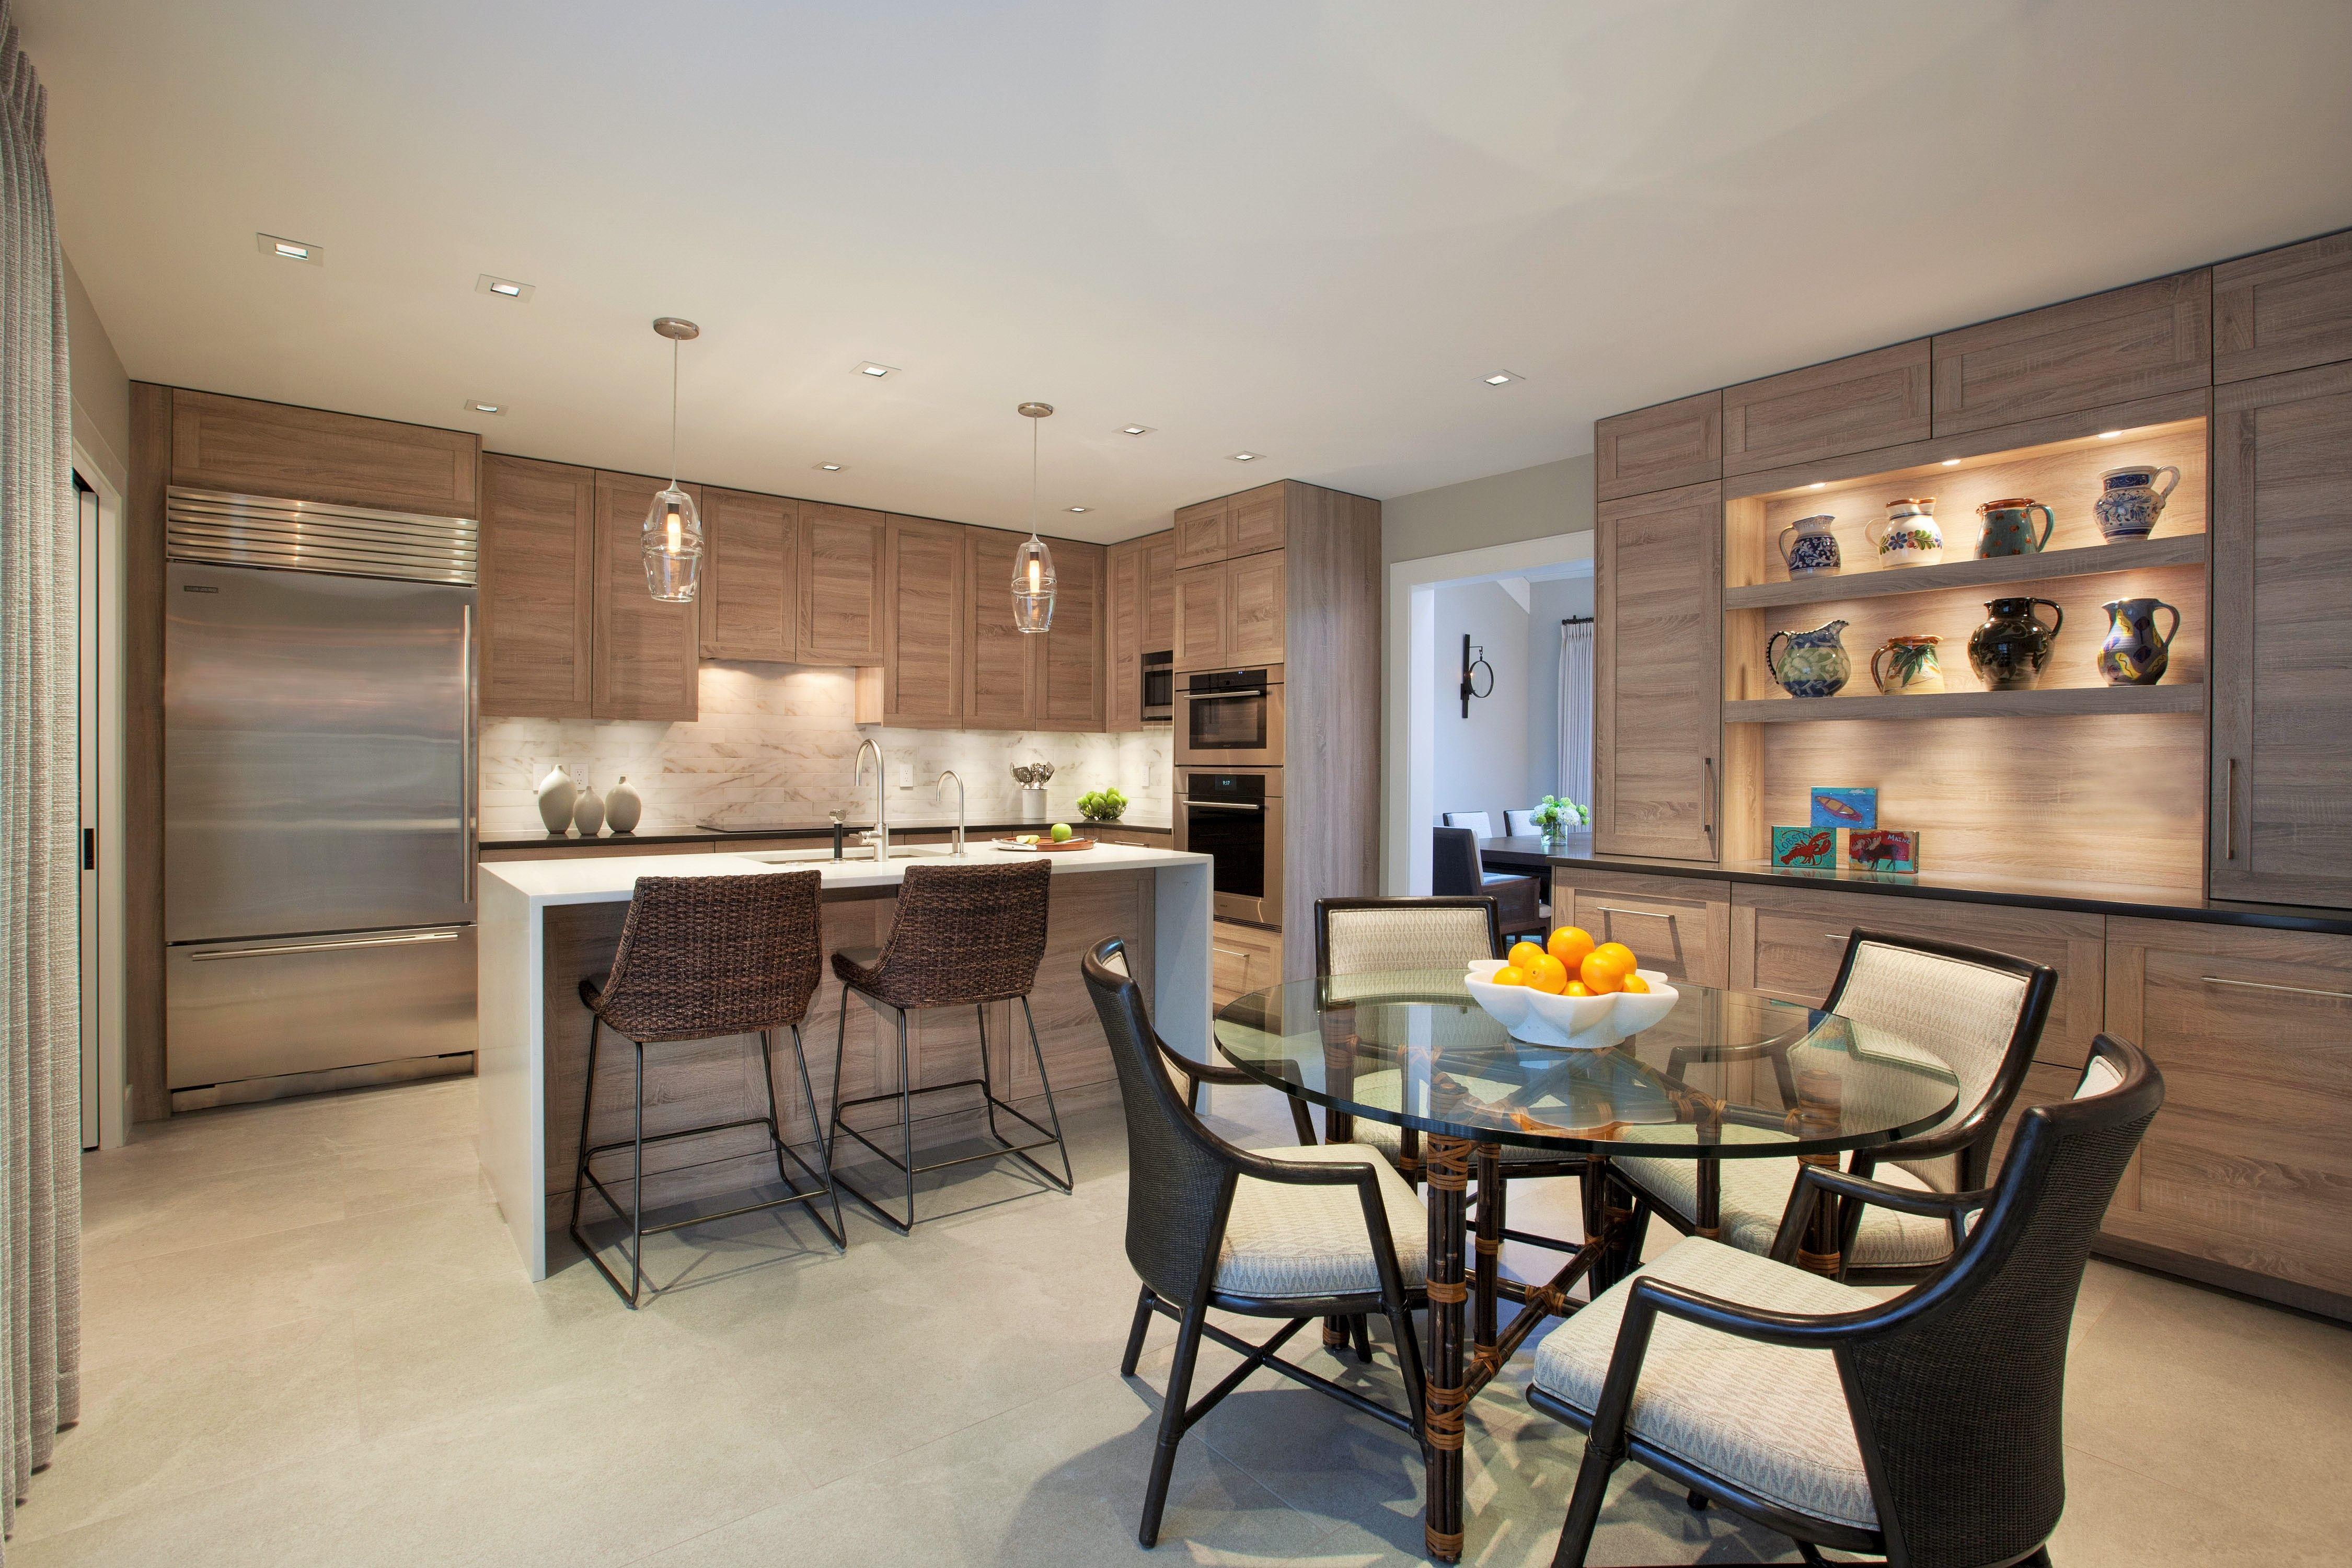 Studio Snaidero Dc Metro S Lux Kitchen In Baltimore Md Elegant Kitchens Italian Kitchen Kitchen Design